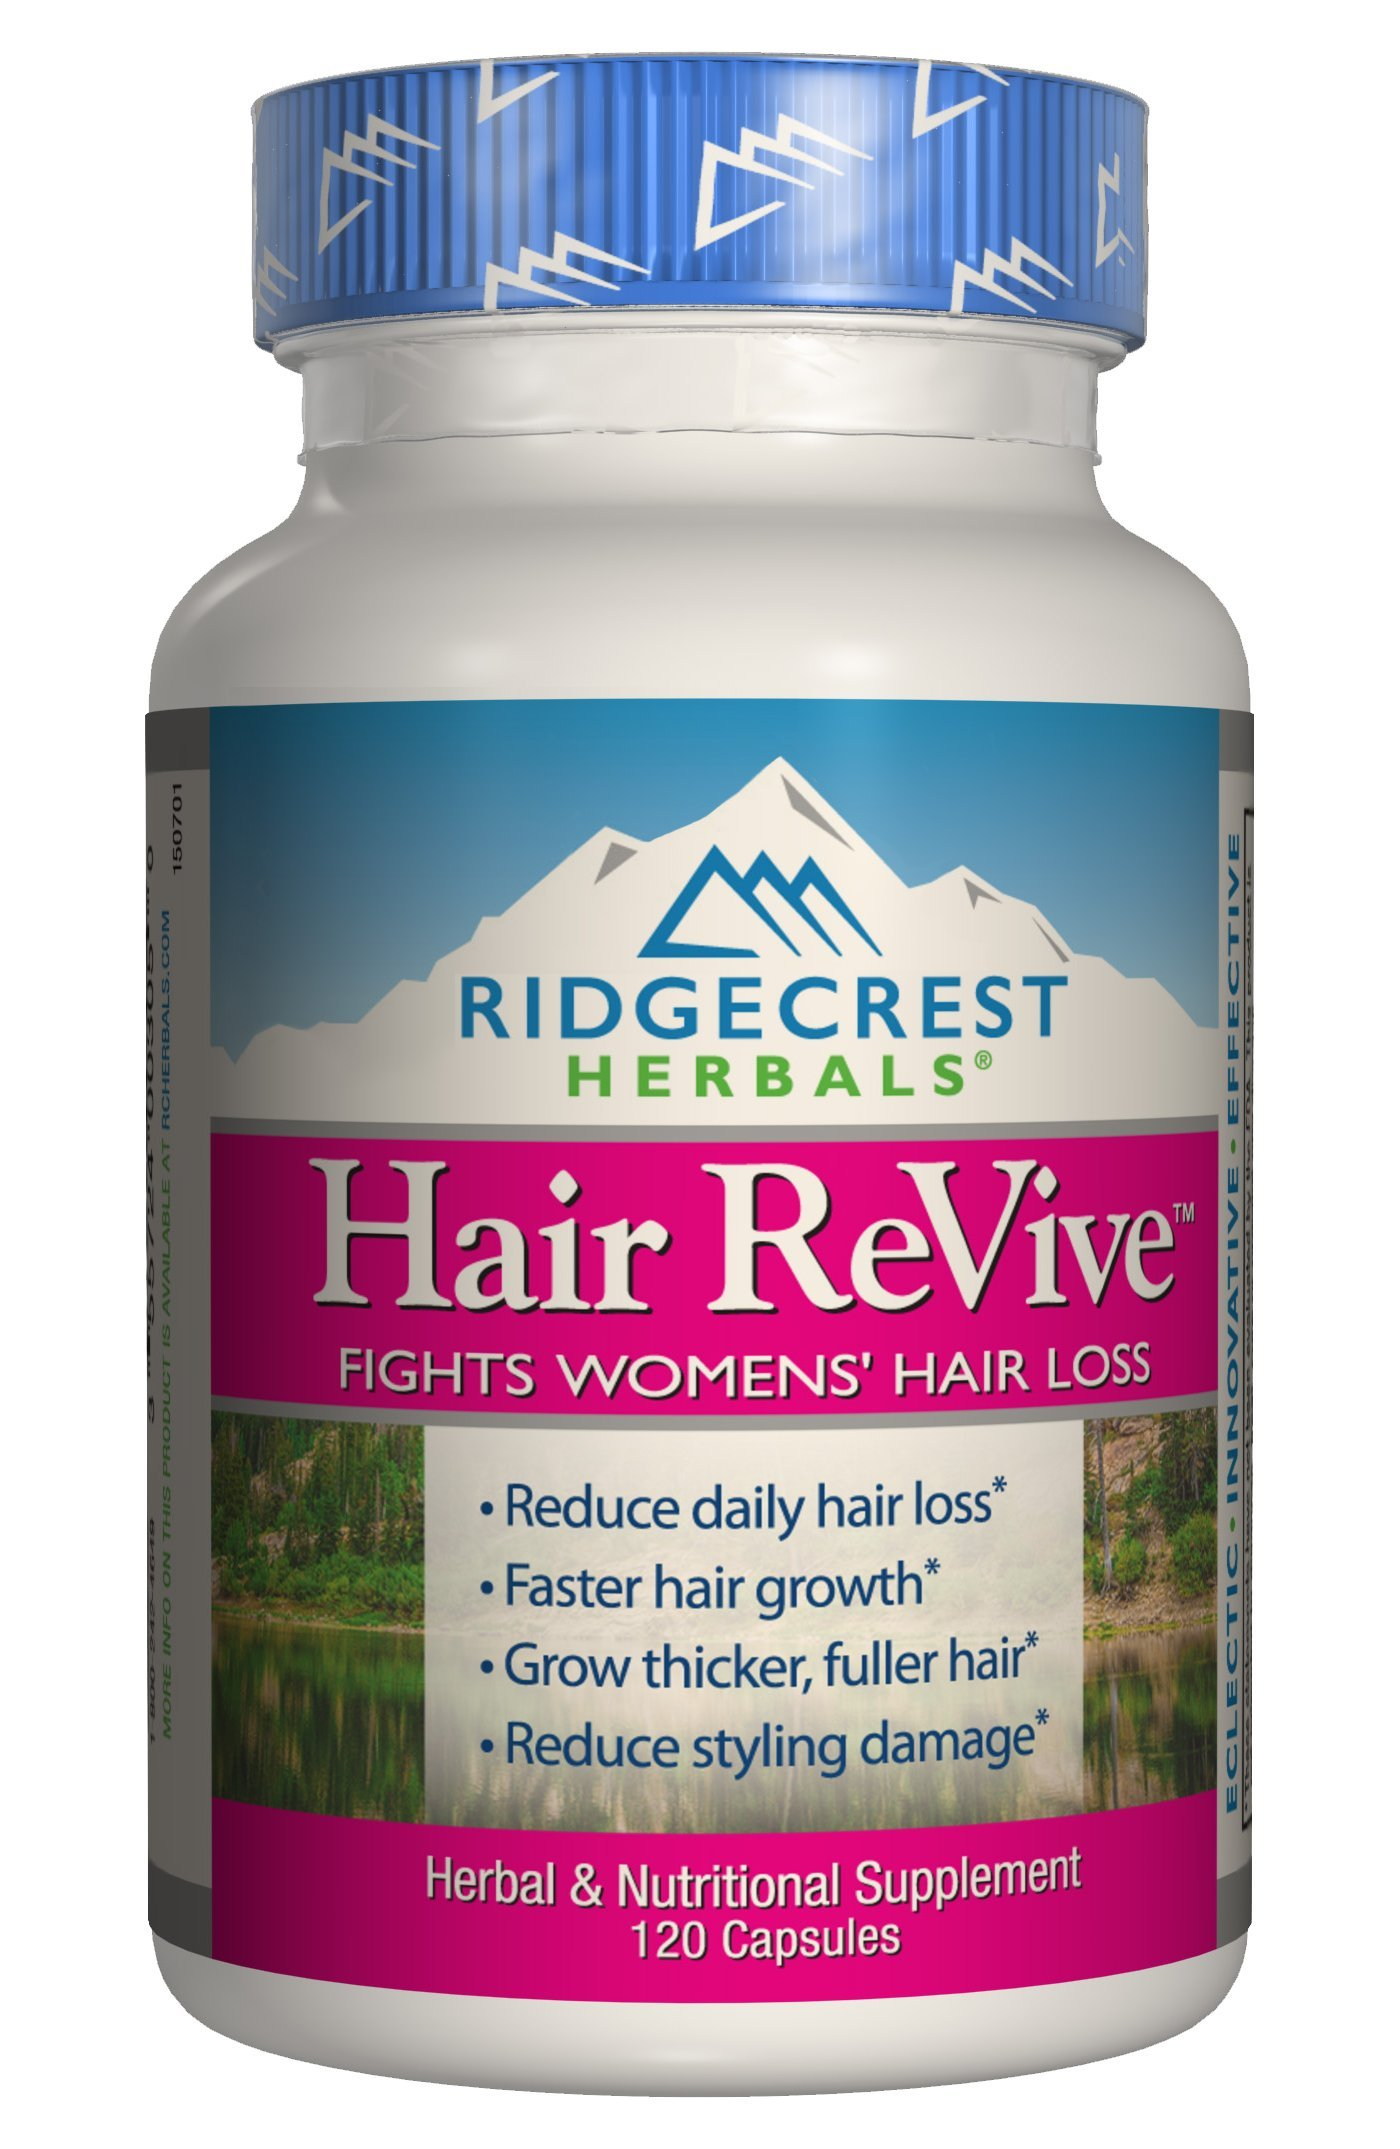 RidgeCrest Herbals Hair Revive Natural Defense Fights Women's Hair Loss Veg Caps 120 by Ridgecrest Herbals